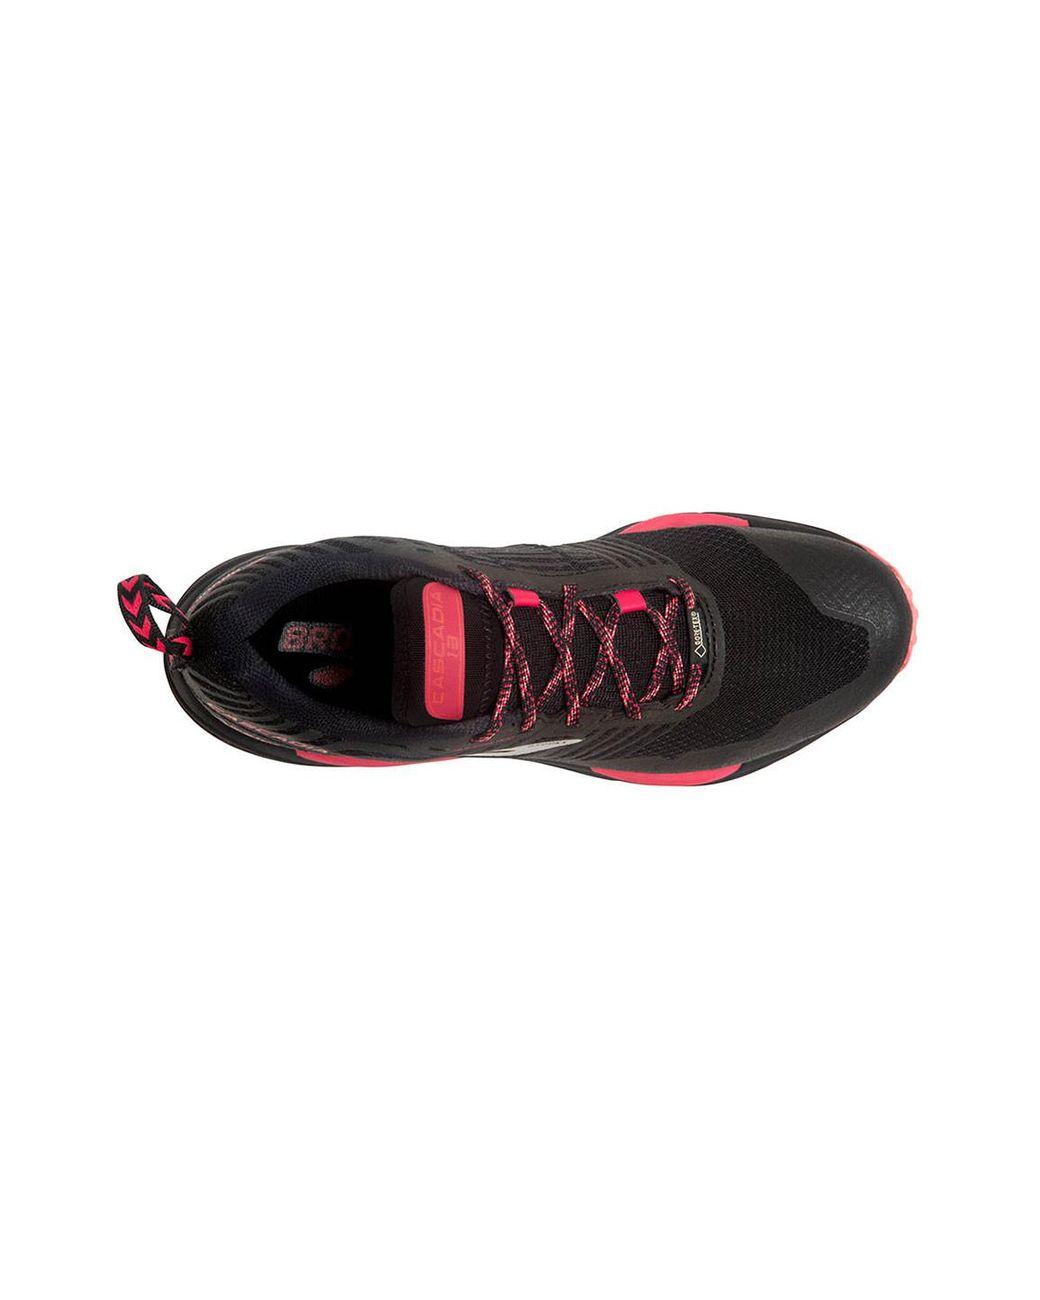 19c1b6ec8bf Lyst - Brooks Cascadia 13 Gtx Trail Running Shoe in Black - Save 1%